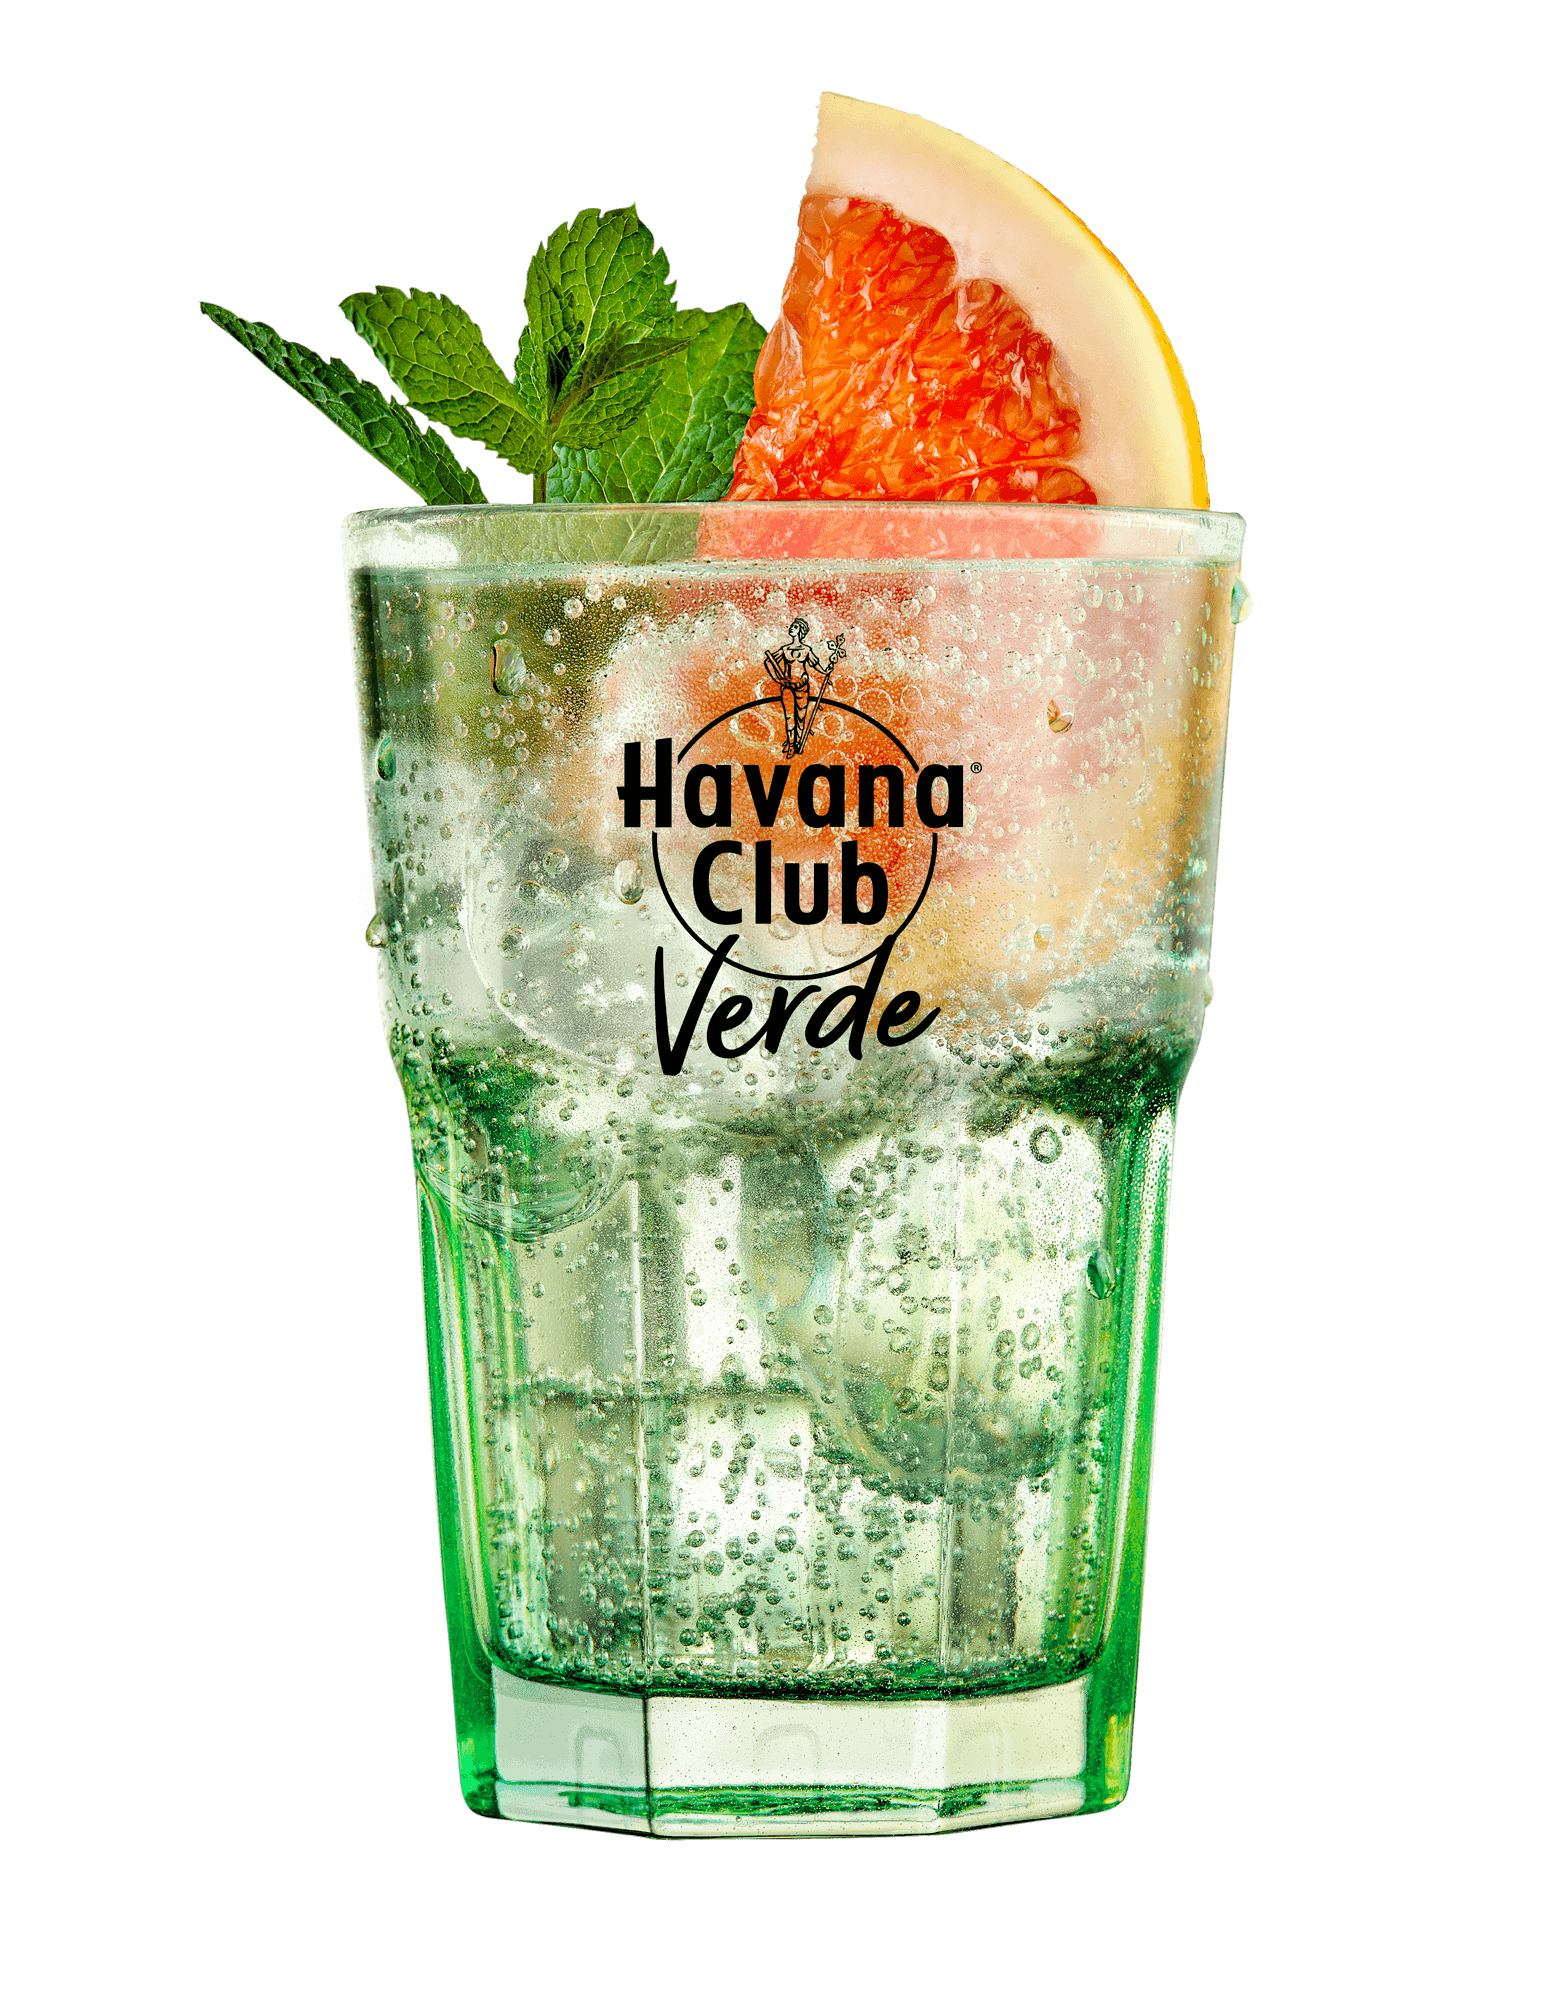 1620226598_havana-club-verde-07l-drinky_1